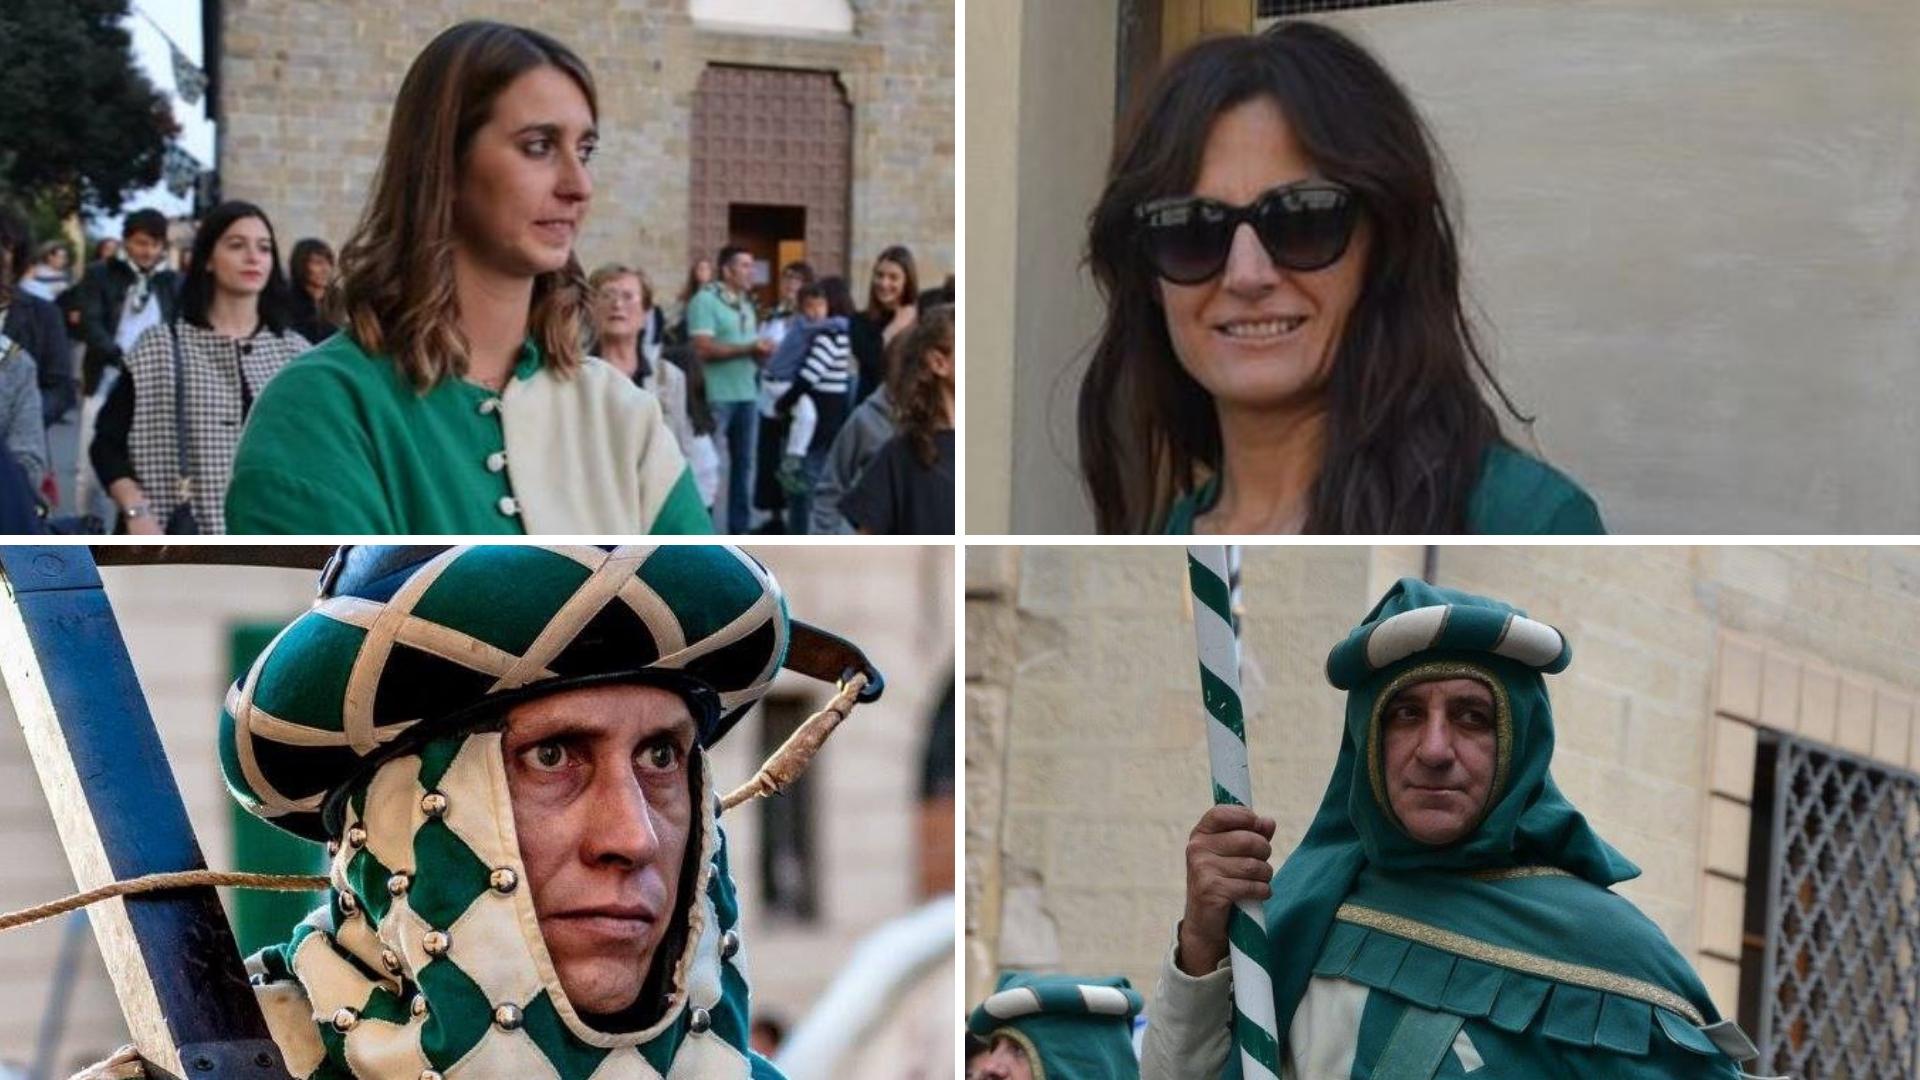 Gabutti, Canocchi, Cini, Ammirati